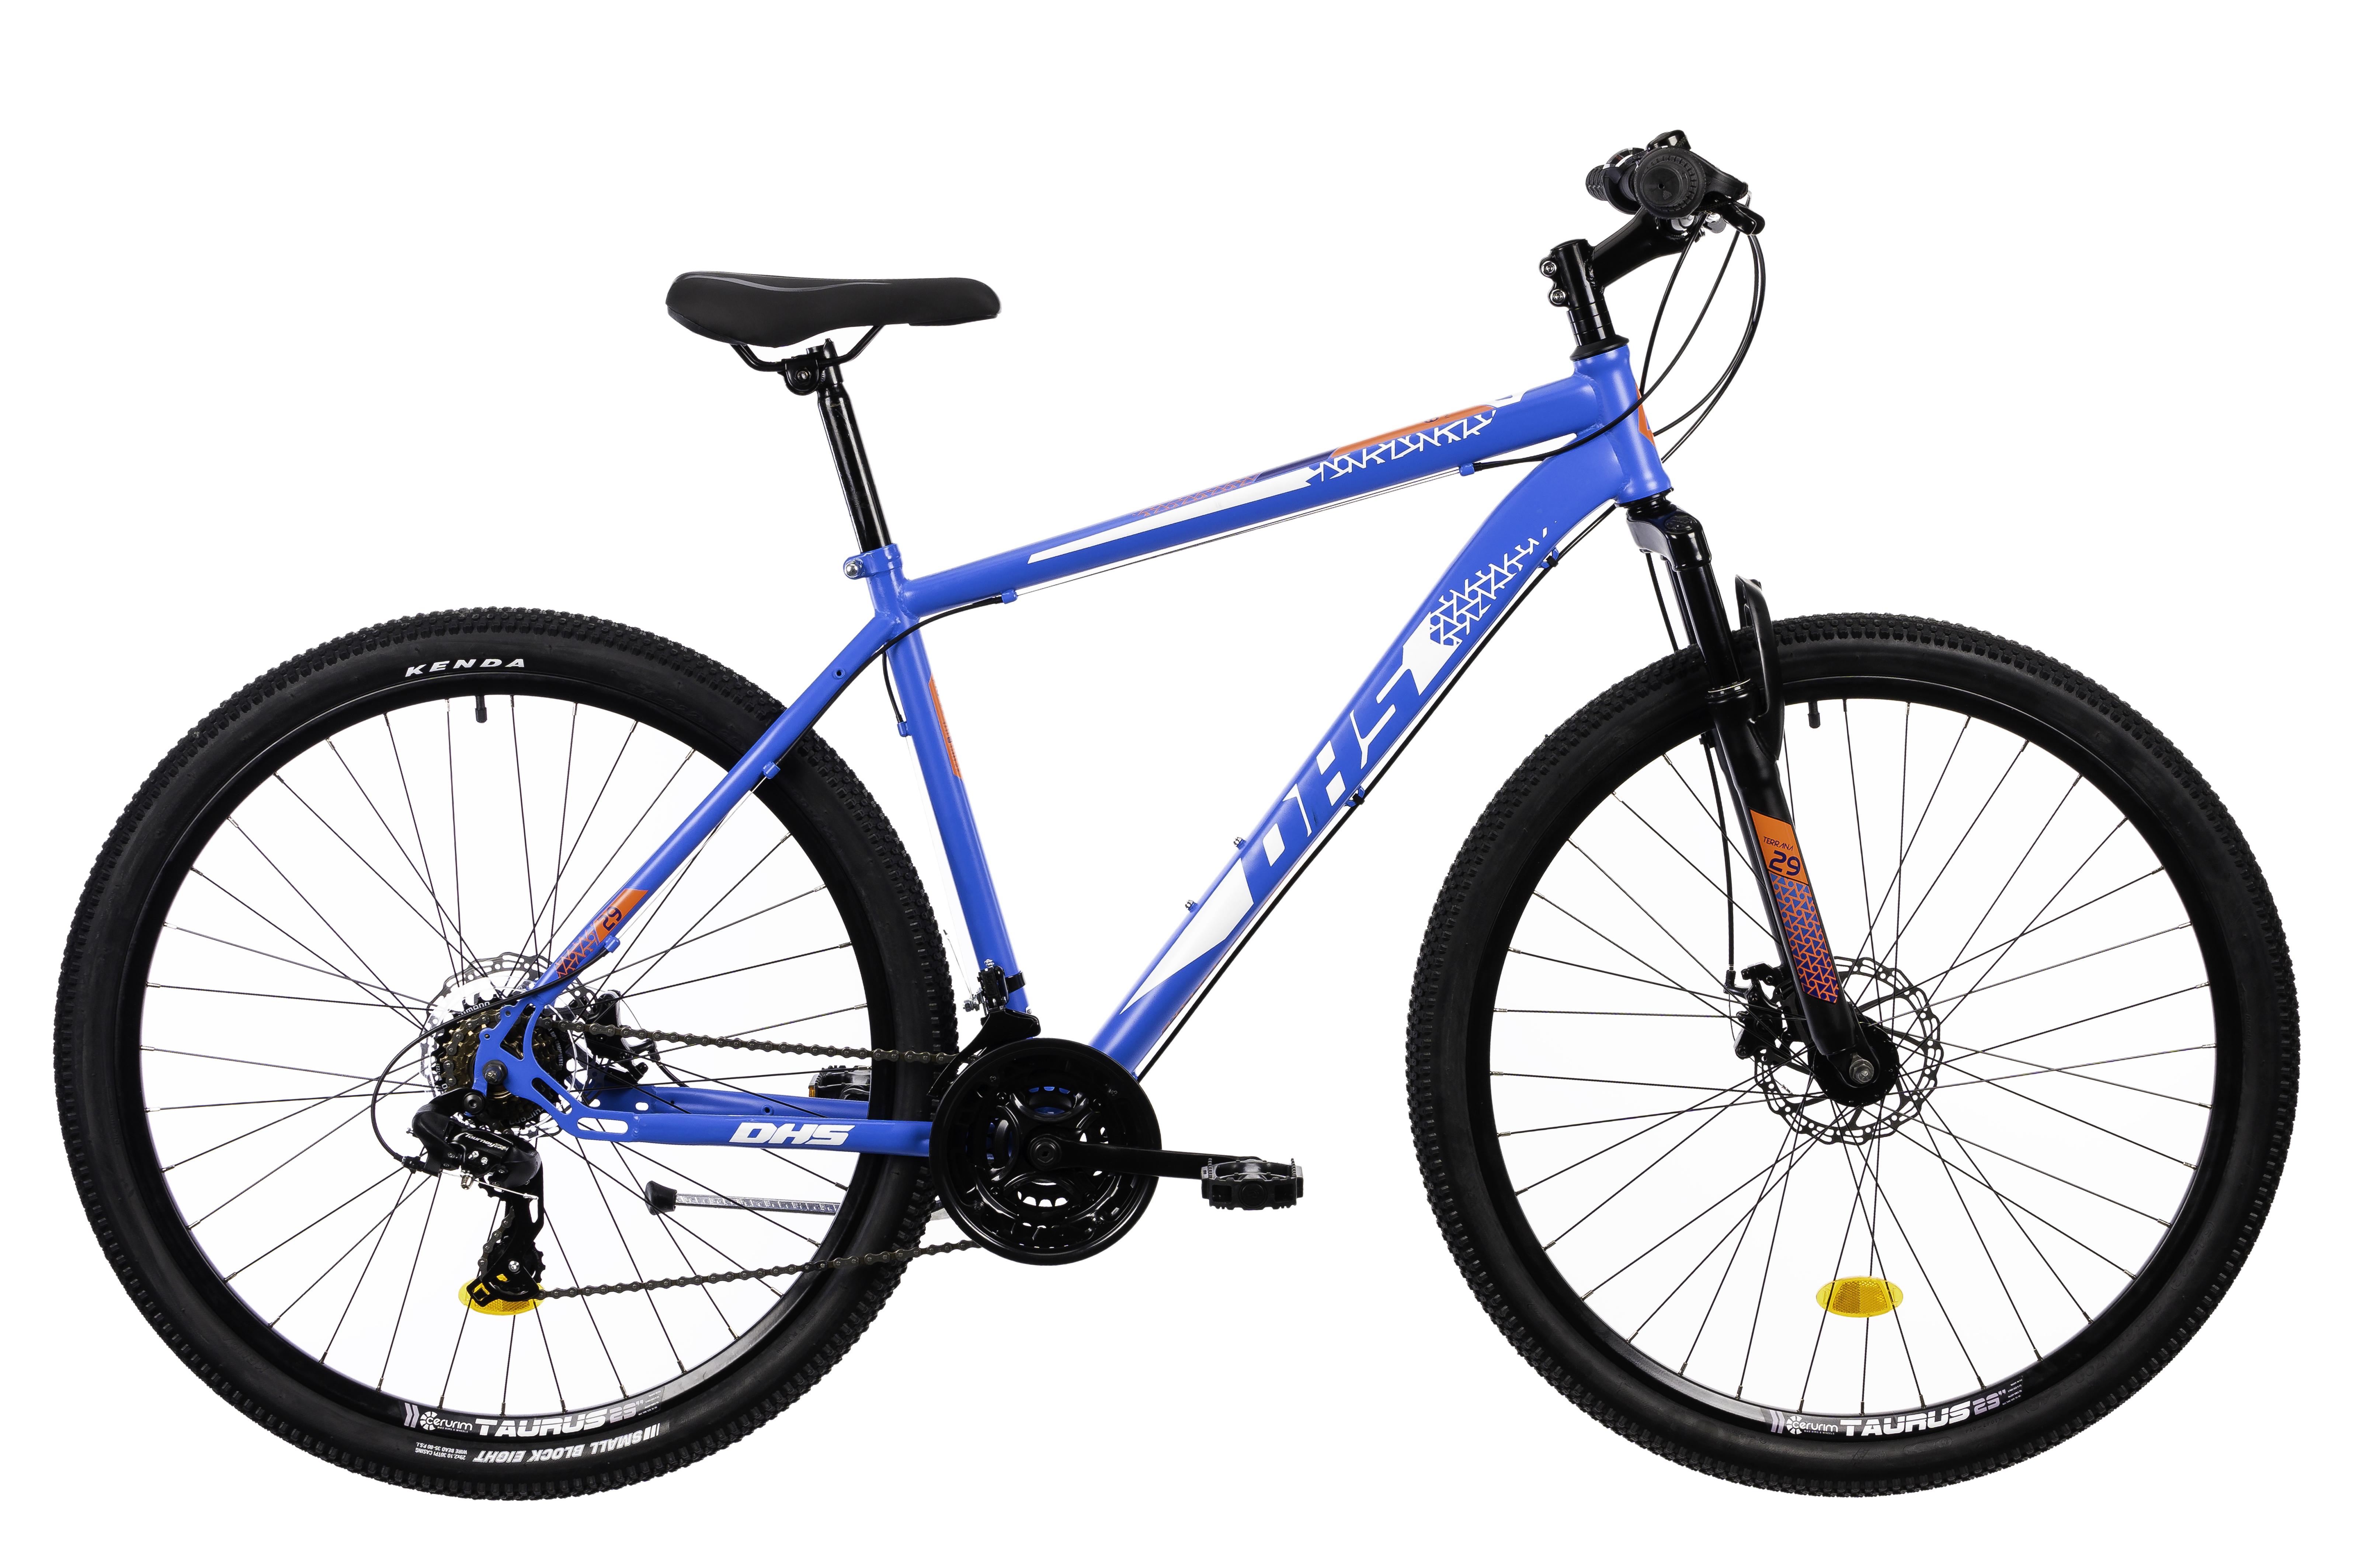 Bicicleta Mtb Terrana 2905 - 29 Inch, M, Gri [8]